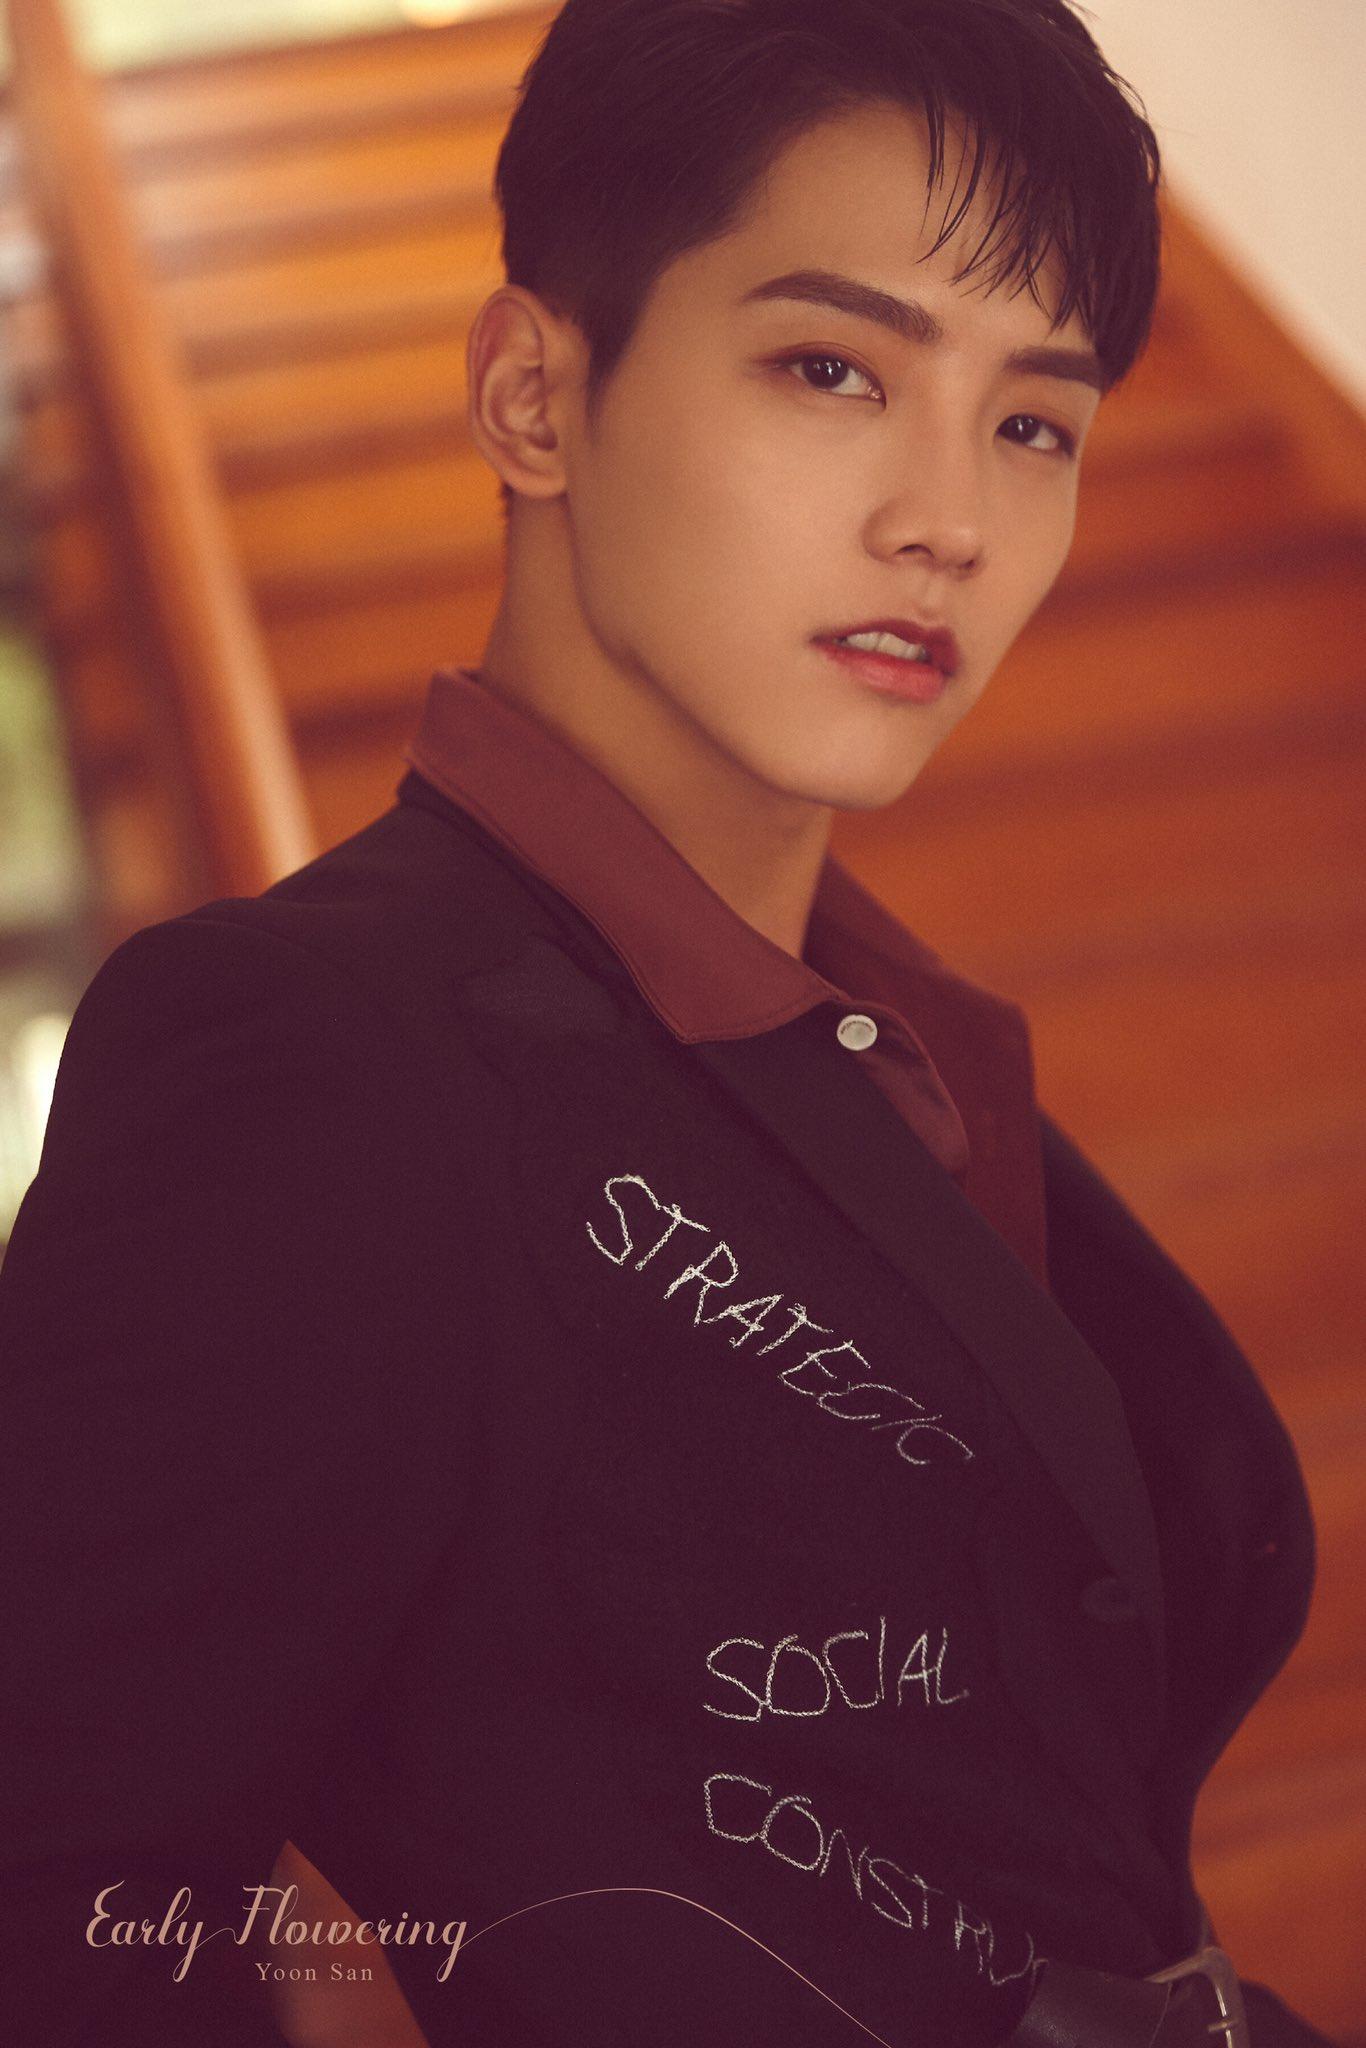 Yoon San